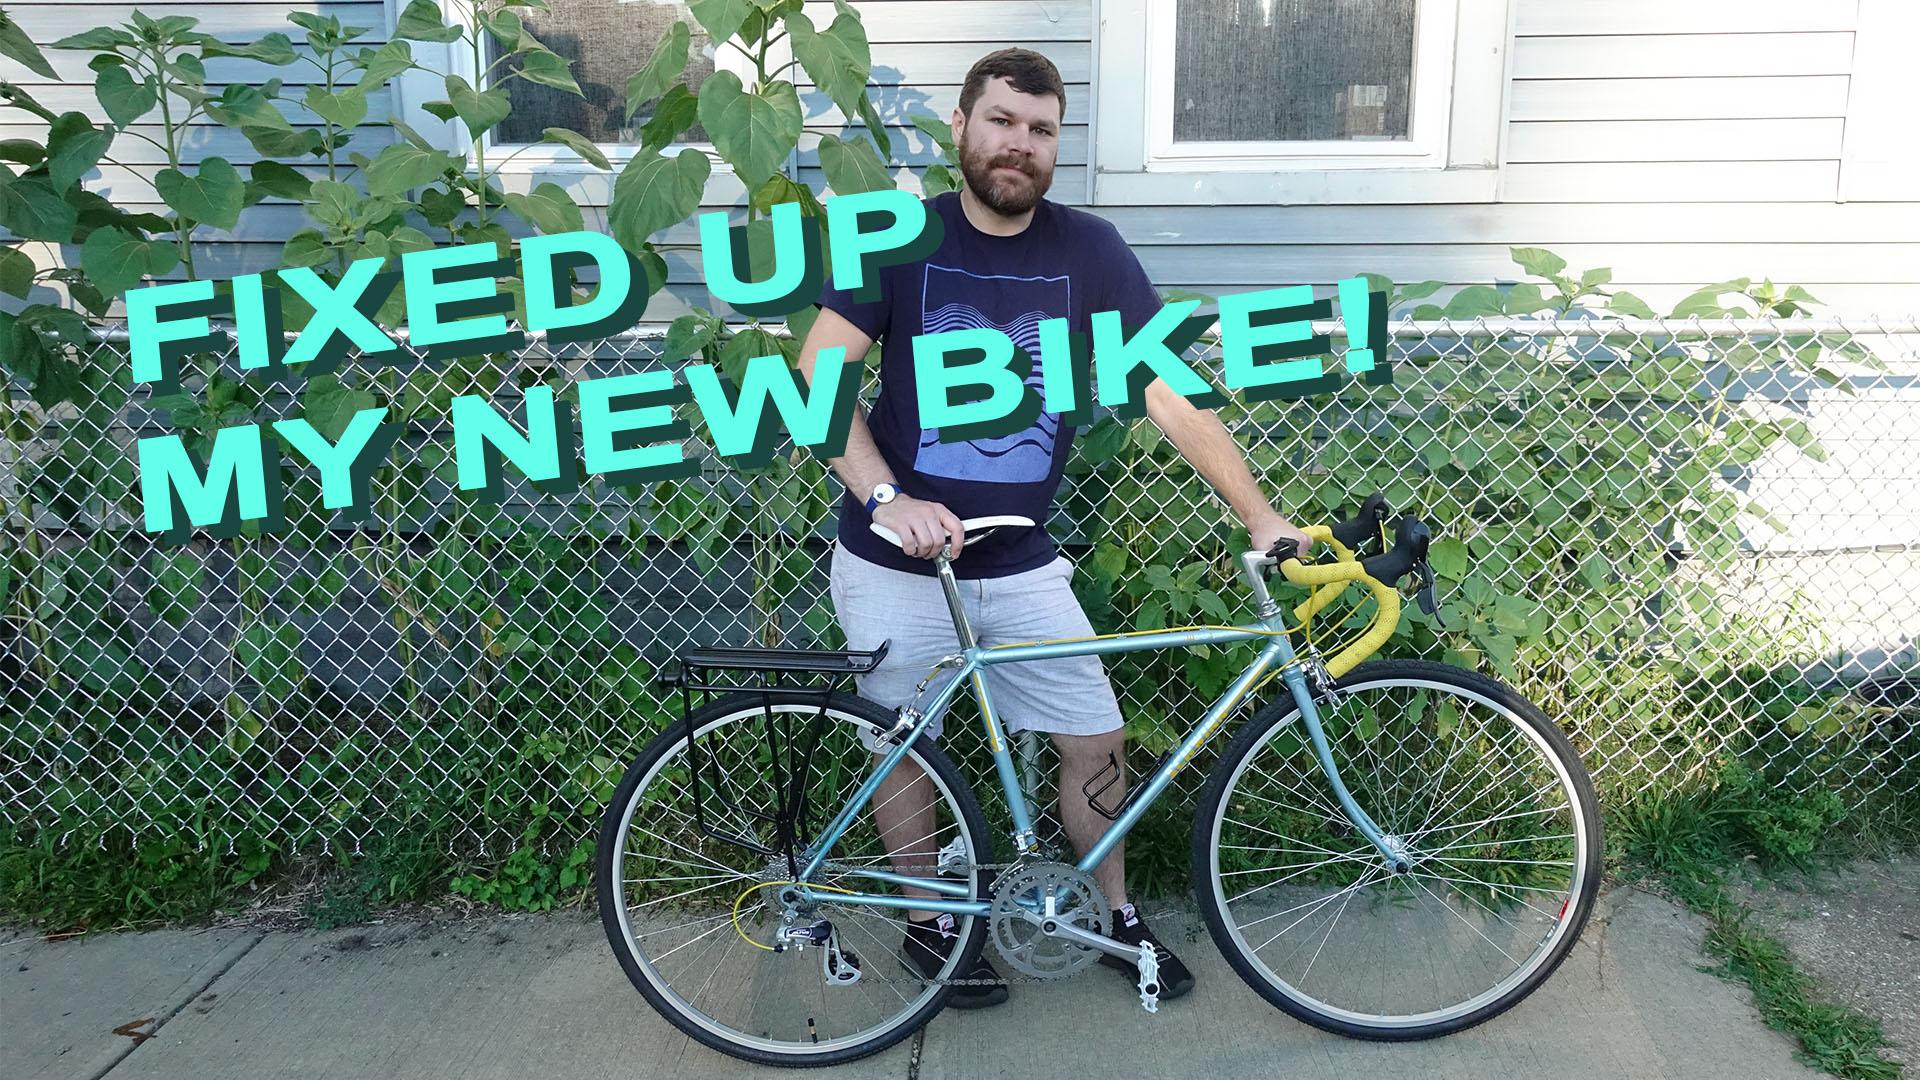 Bike Repair | Fixing up a 1985 Schwinn World Sport | Gravel Cargo City Bicycle